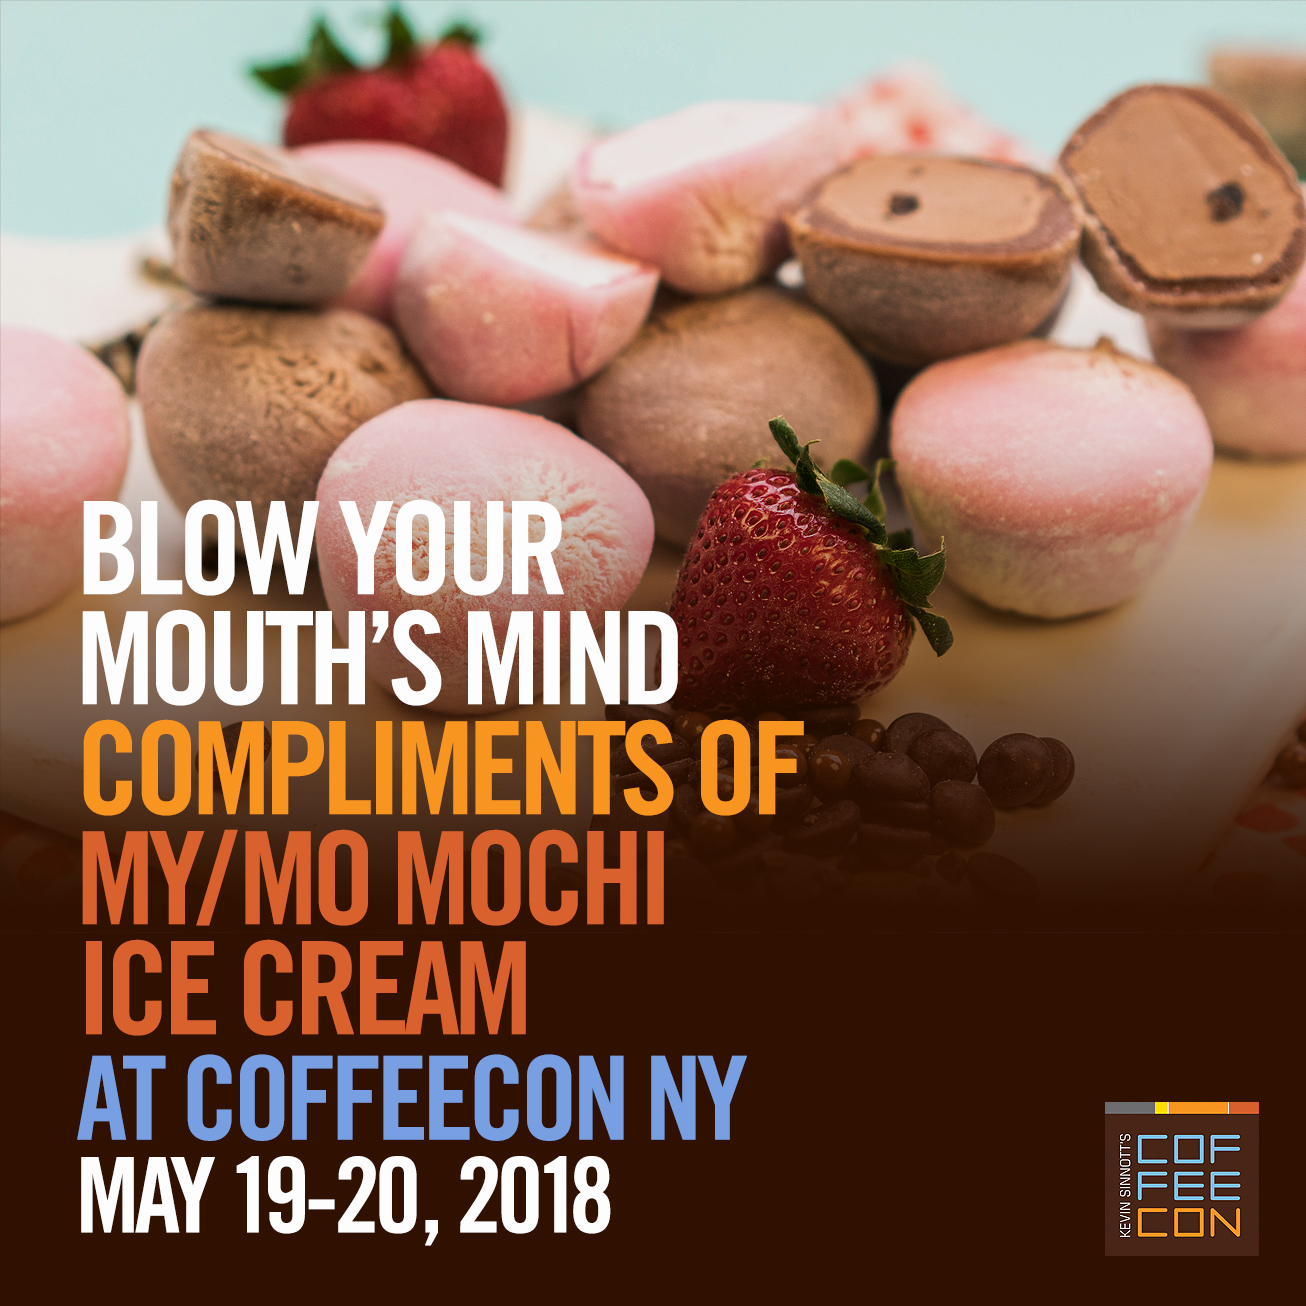 My/Mo Mochi Ice Cream at CoffeeConNY